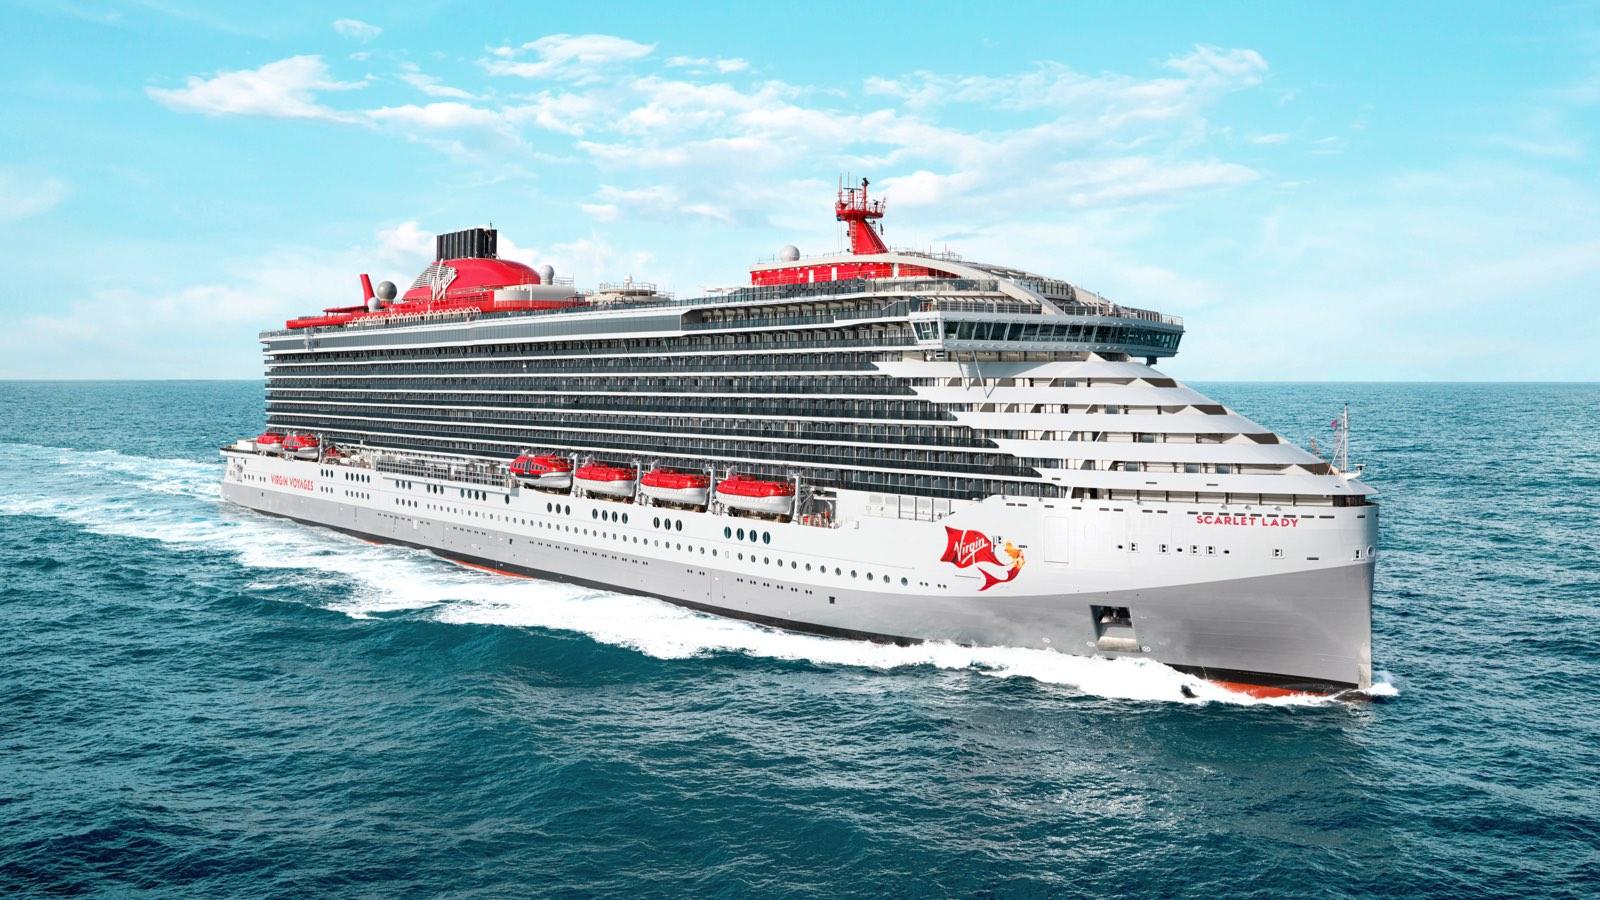 Virgin Voyages' Inaugural Season has been further delayed